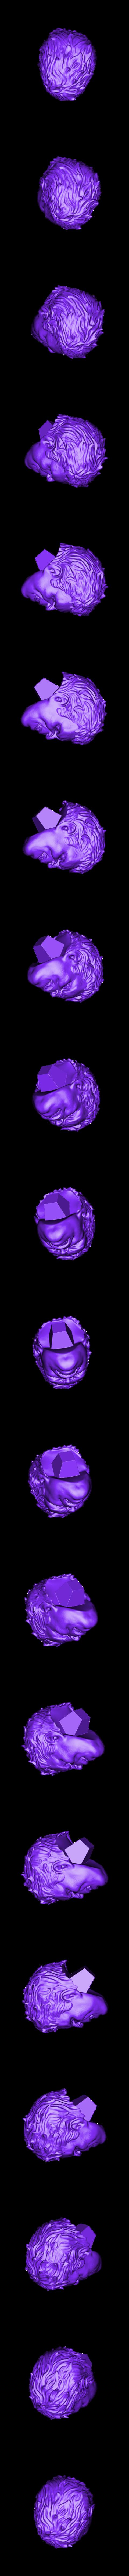 Head_300mm.stl Download STL file Hulk Angry - Super Hero - Marvel 3D print model • 3D print model, Bstar3Dart